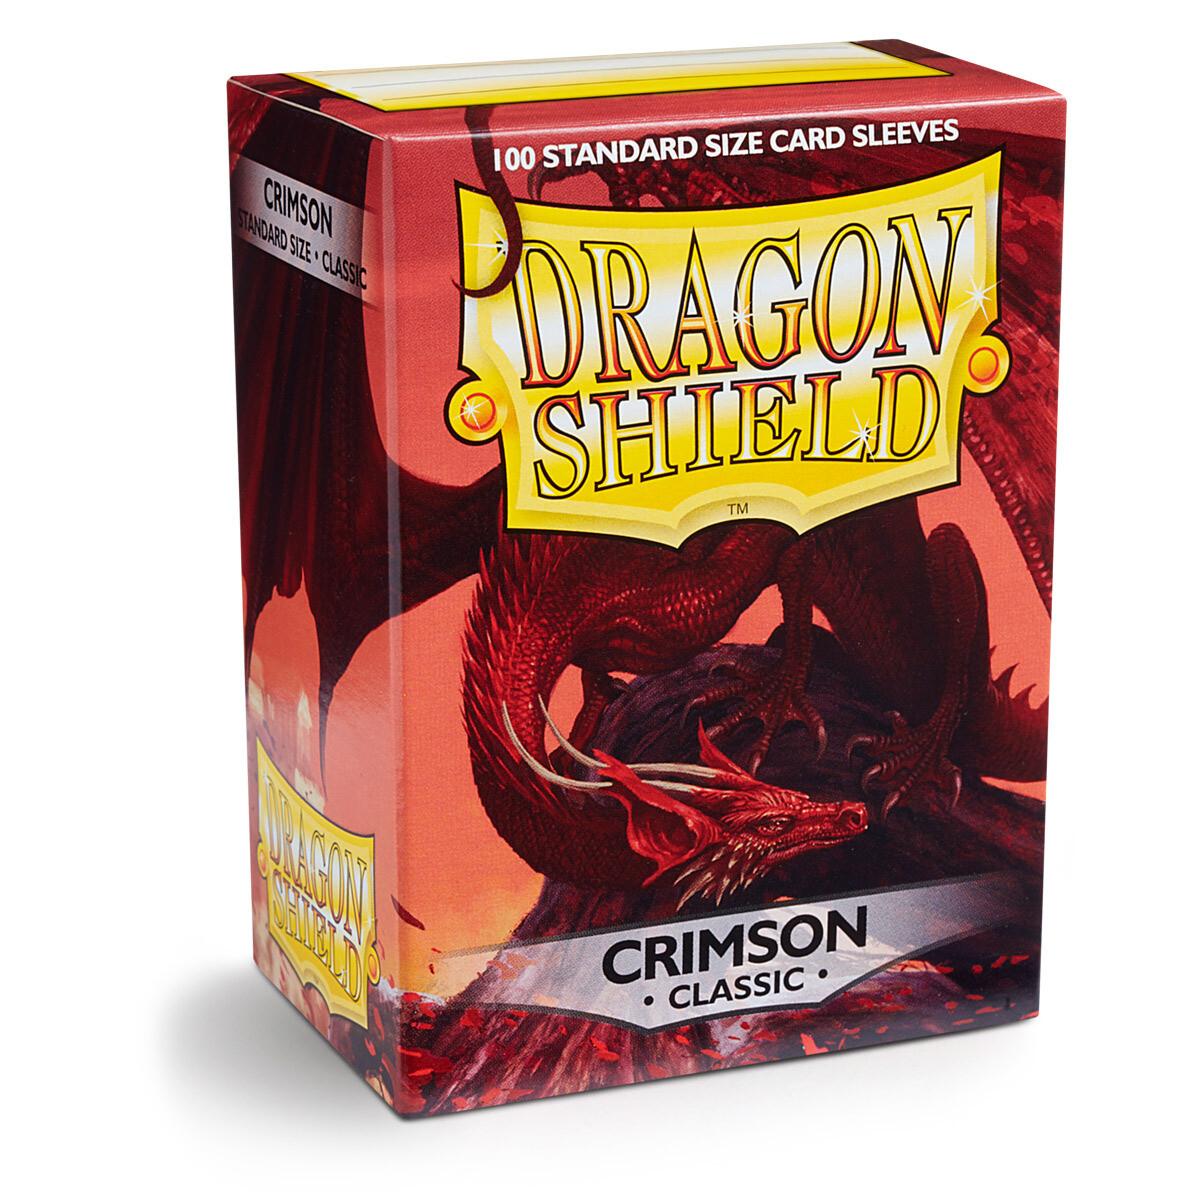 Dragon Shield 100 Sleeves - Crimson Classic